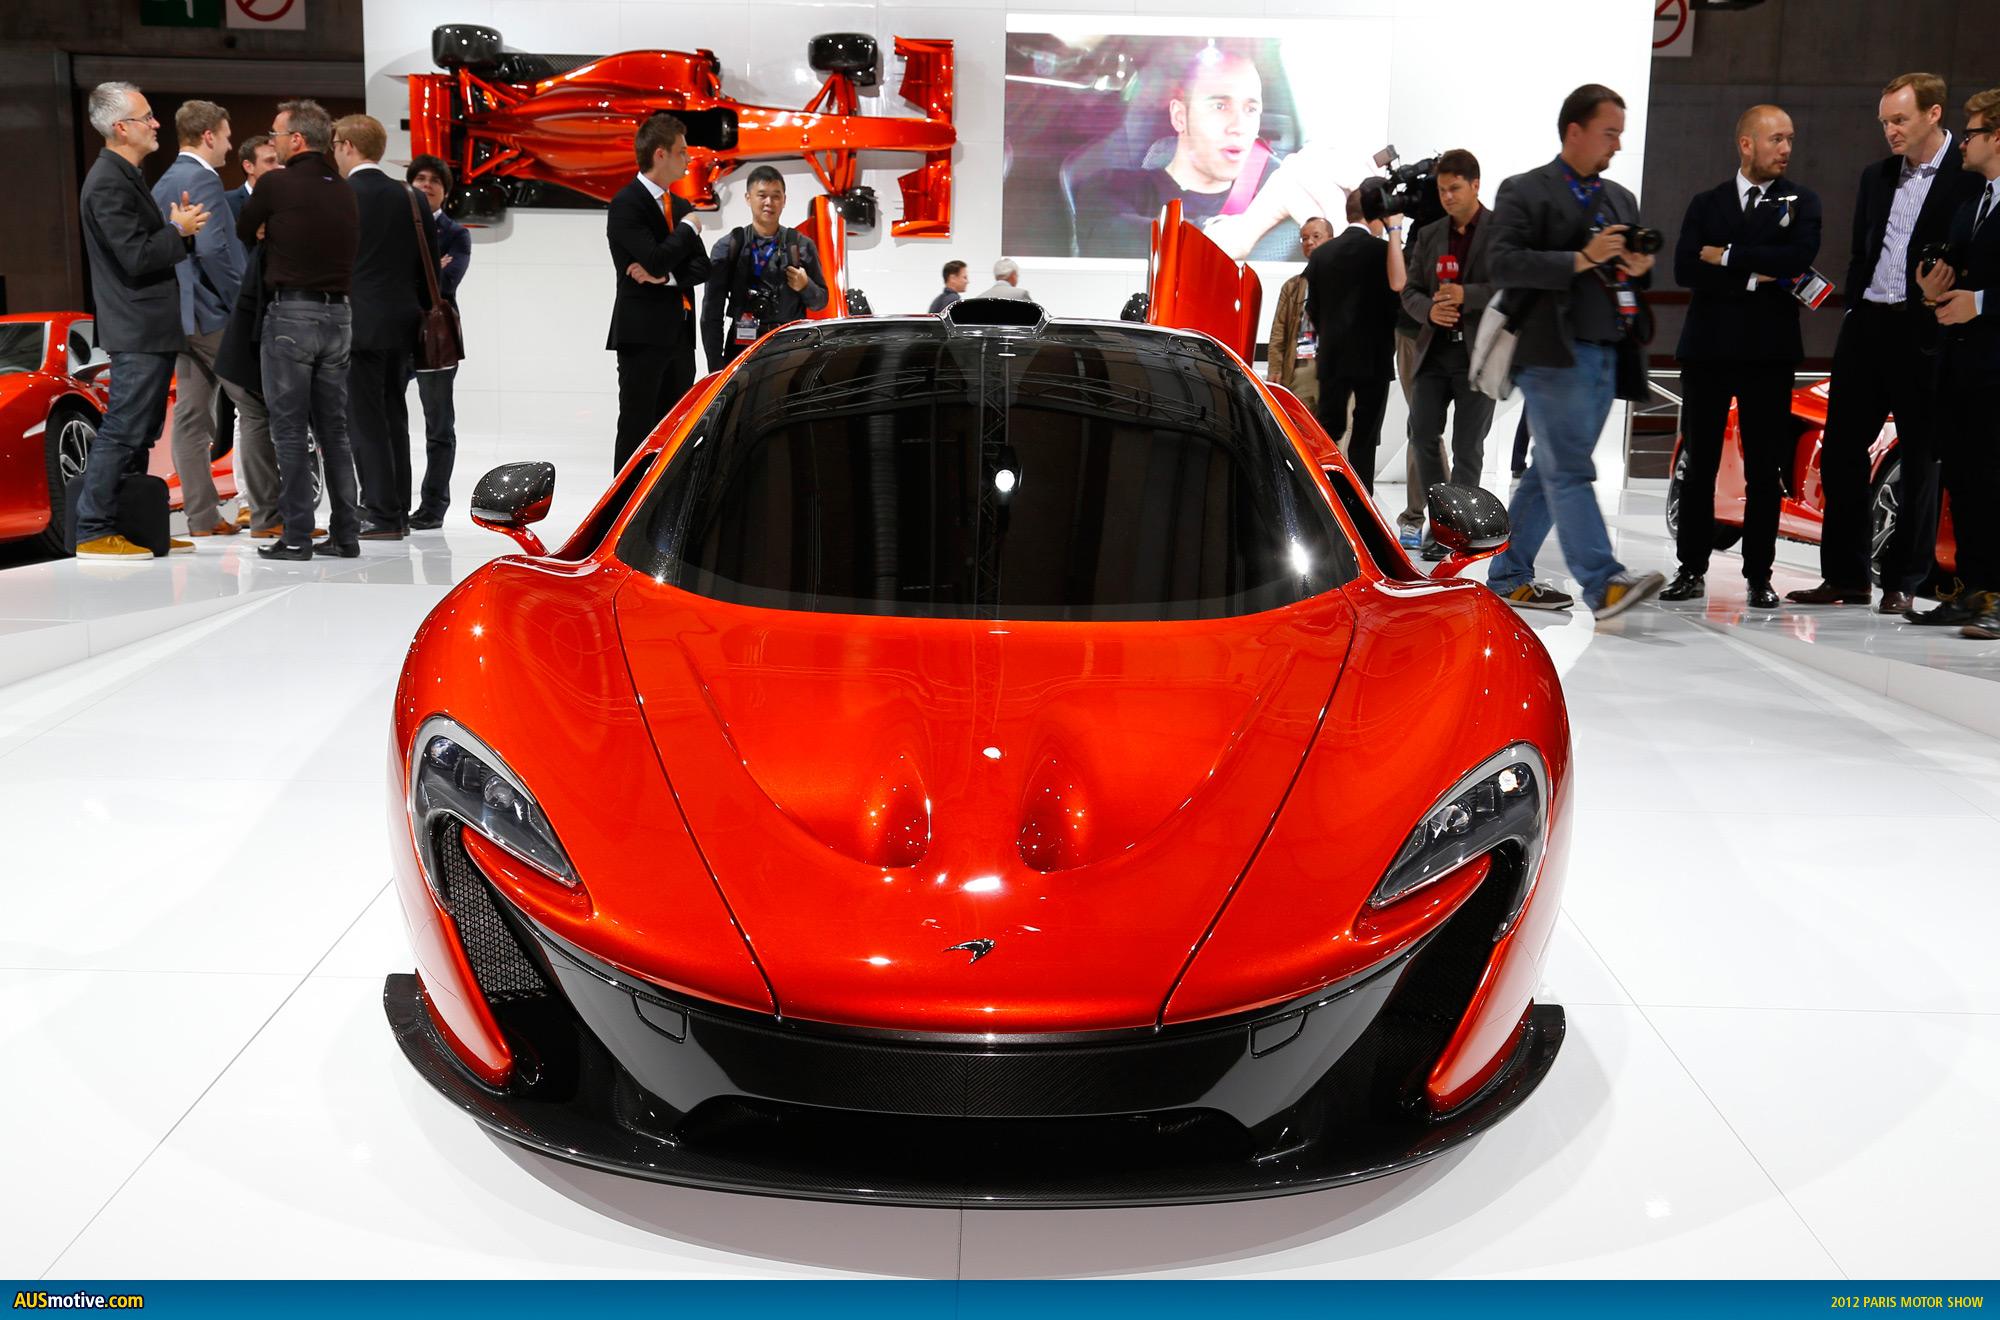 http://www.ausmotive.com/pics/2012/paris/McLaren-03.jpg